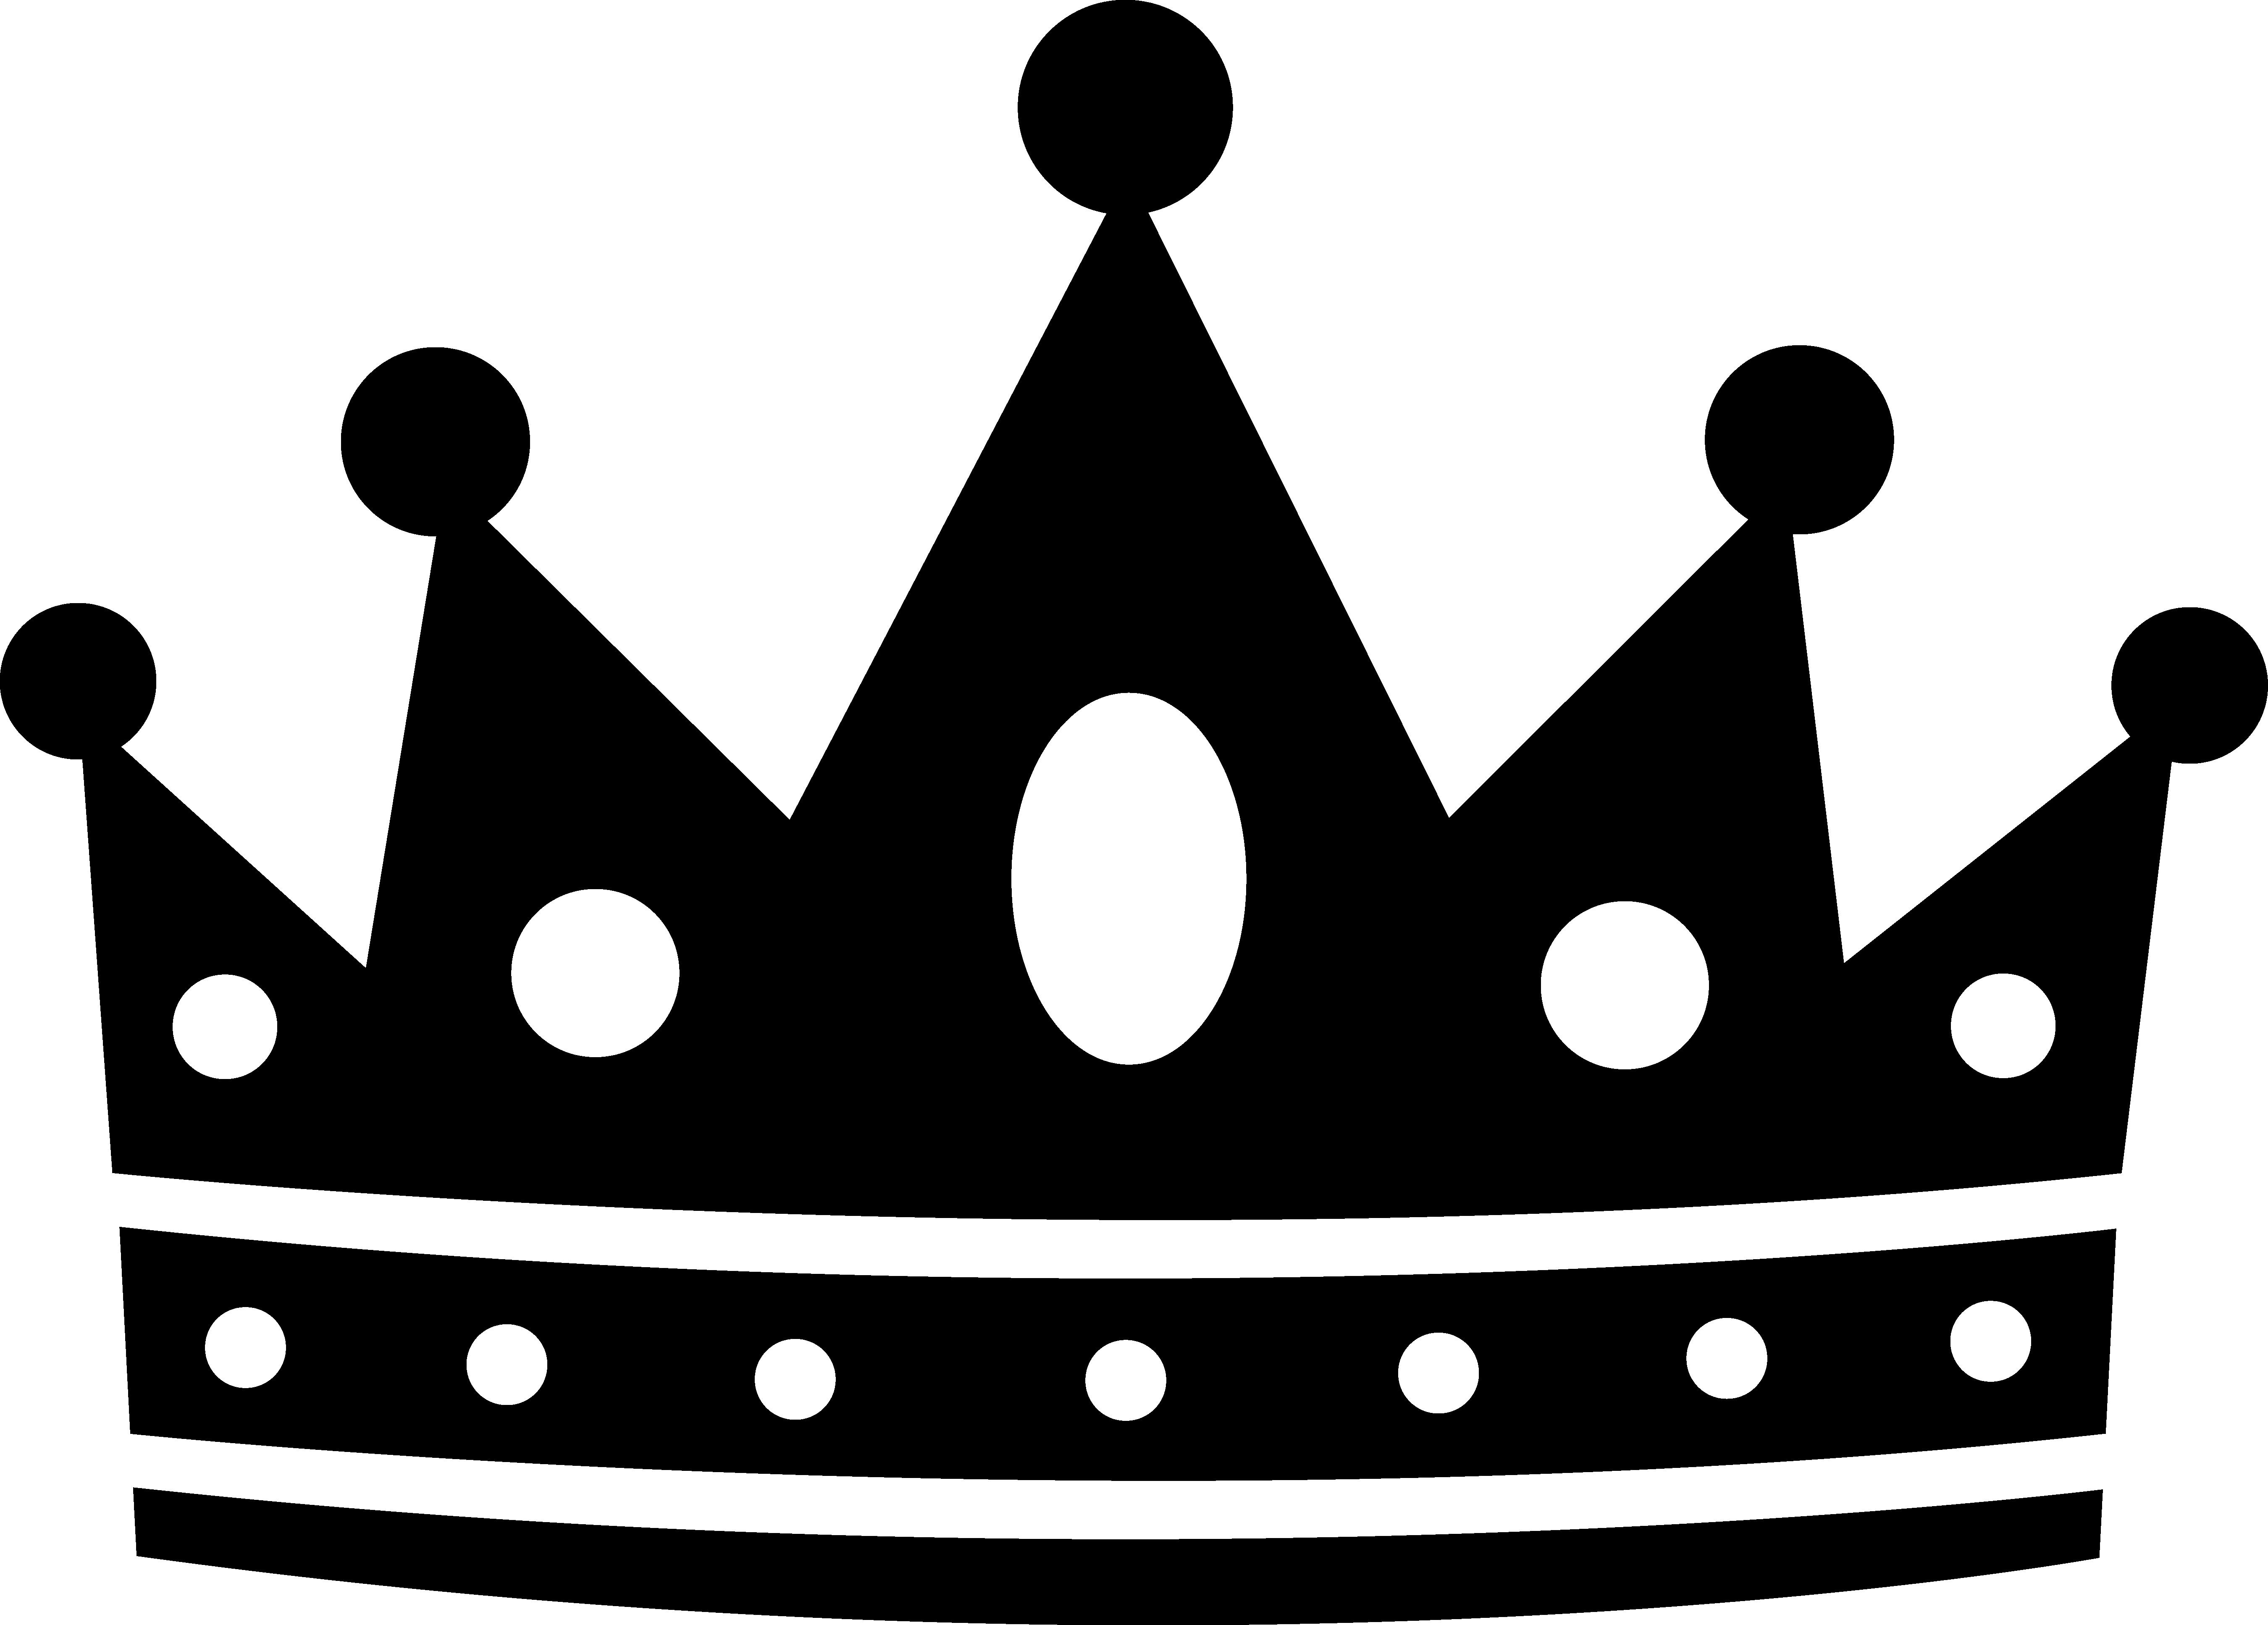 King And Queen Crown Logo By Amos Gulgowski Crown Clip Art Crown Silhouette King And Queen Crowns